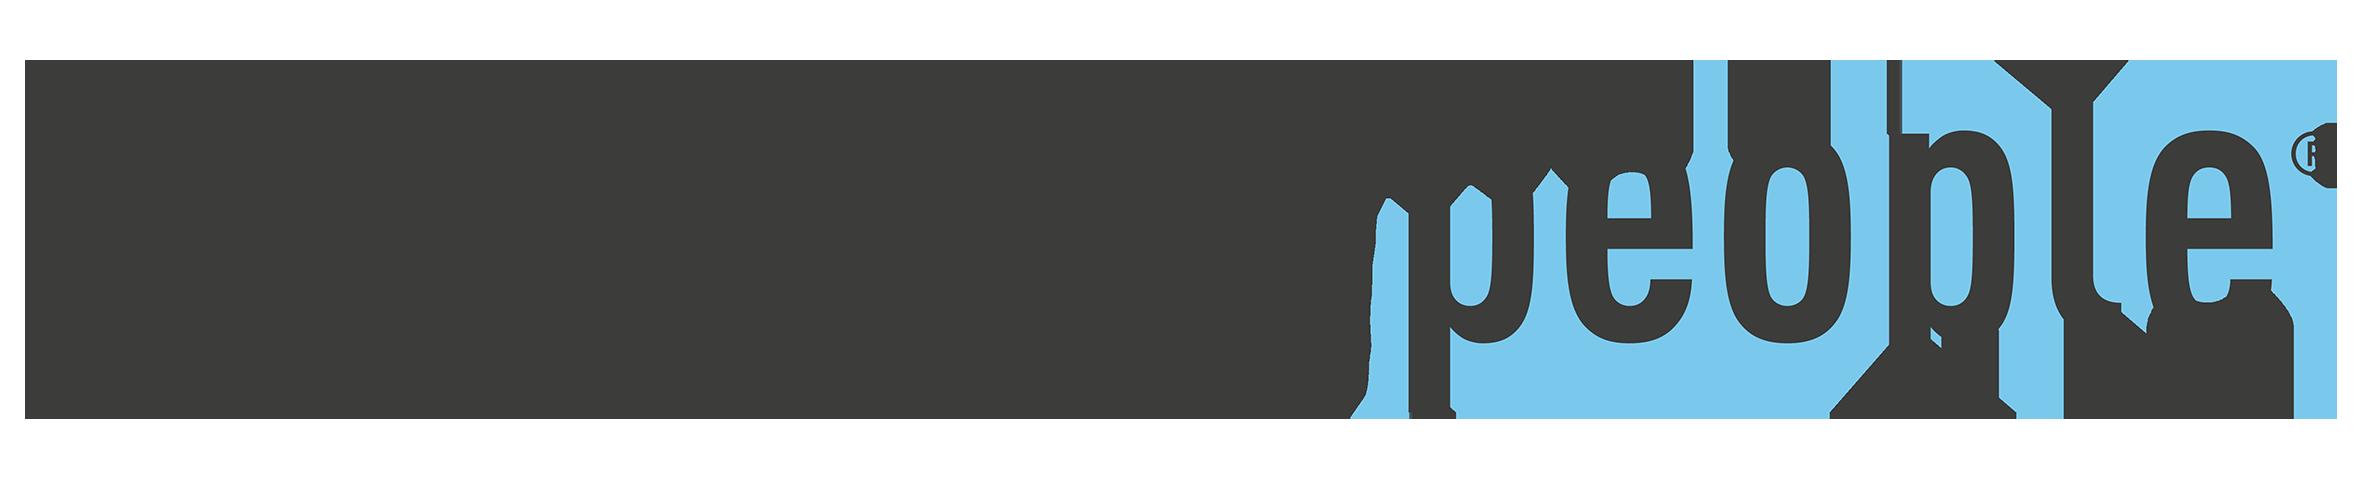 ASCENDINGPEOPLE logo RGB